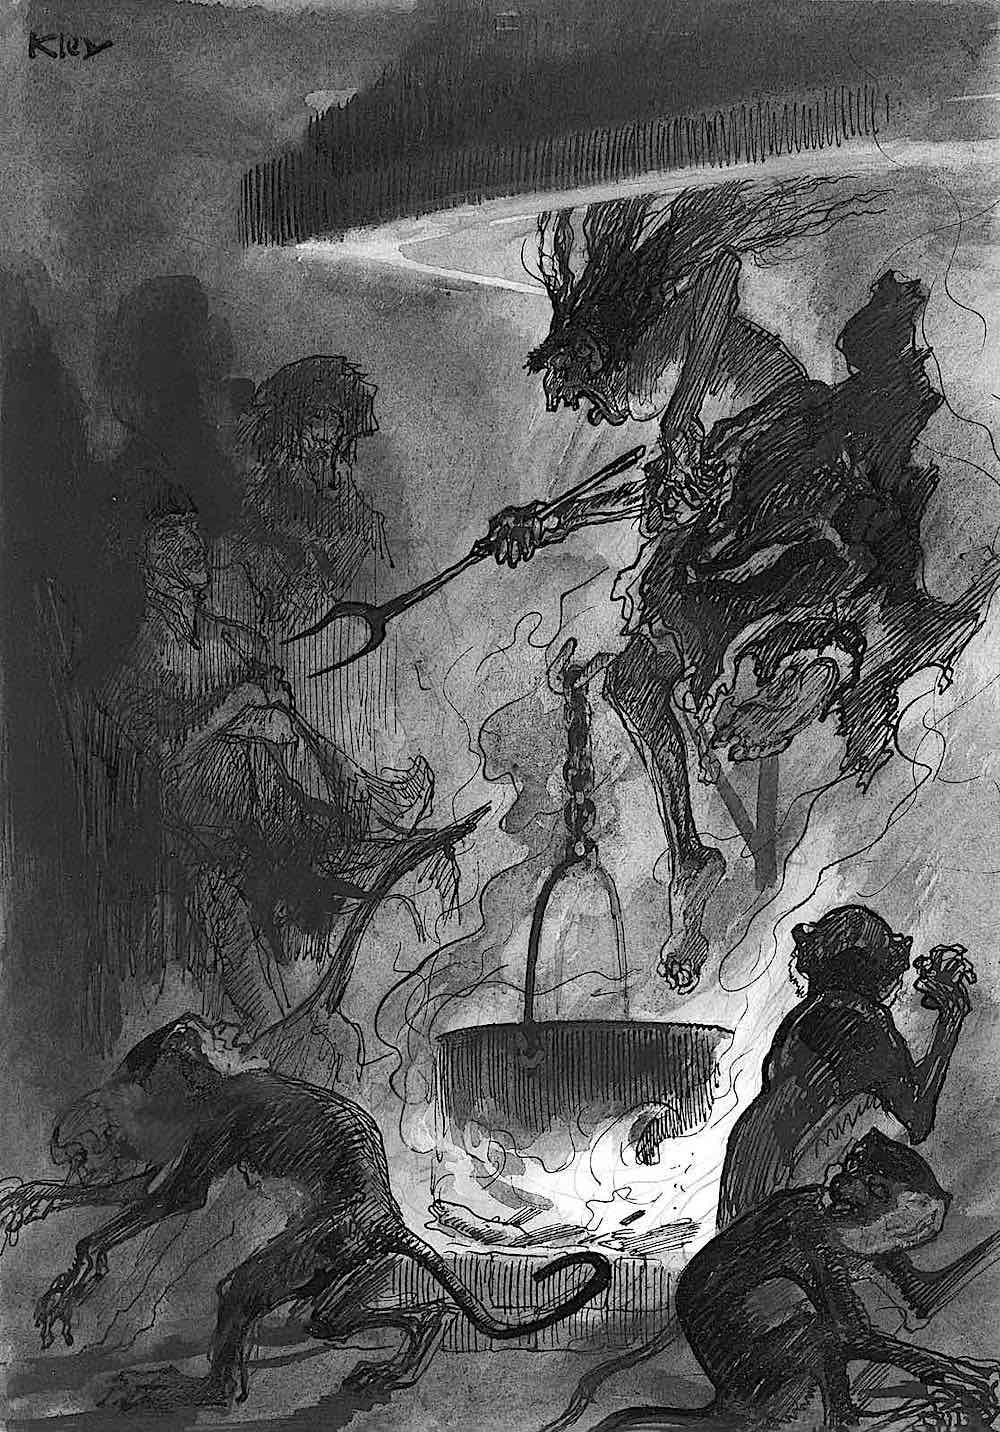 Heinrich Kley demons